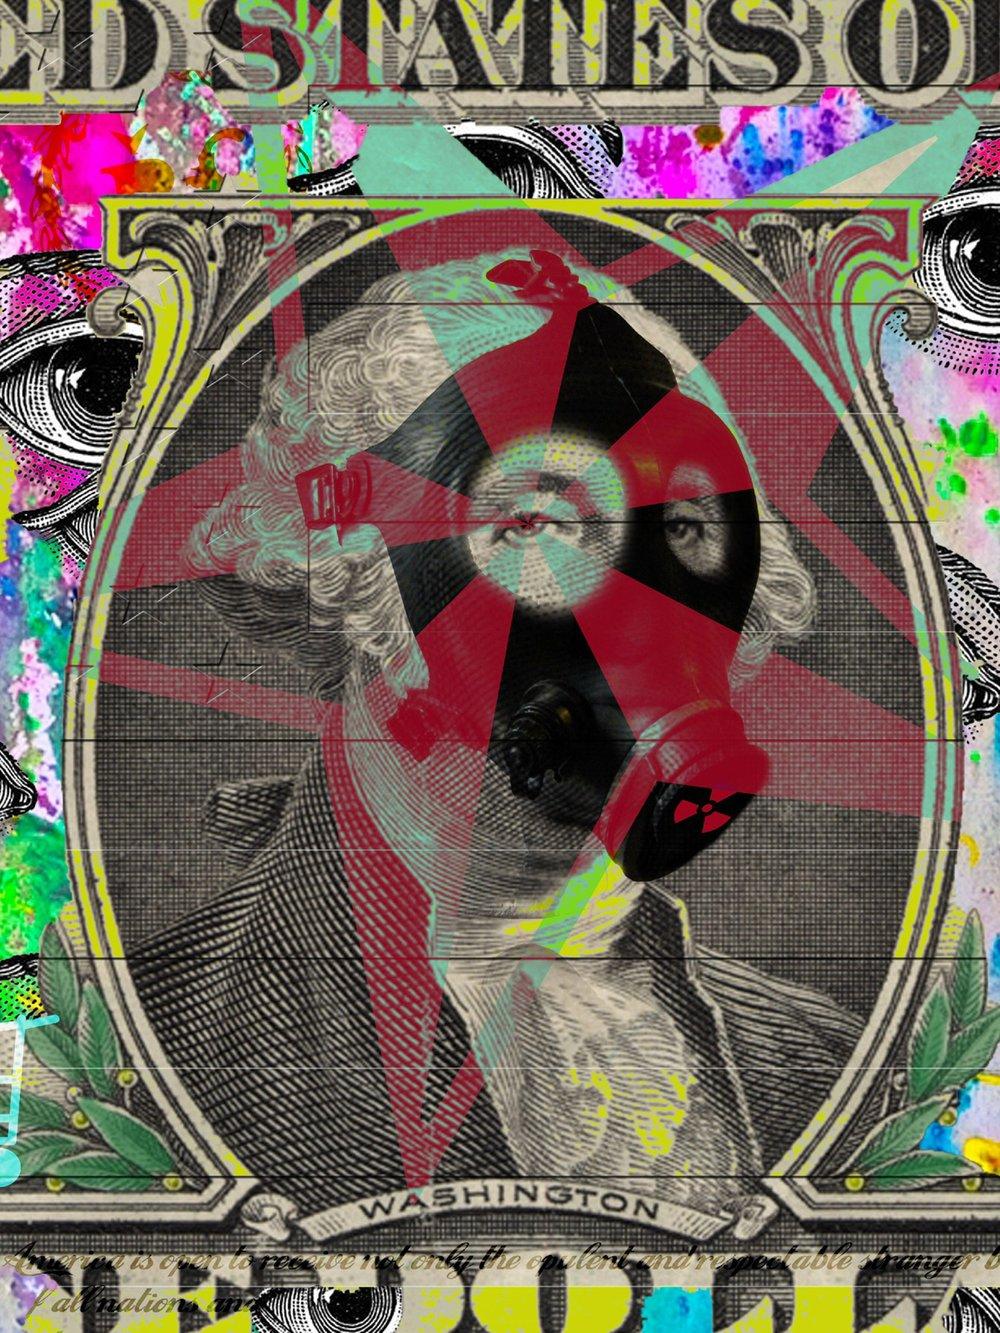 Image of Washington (Mea Culpa) Poster